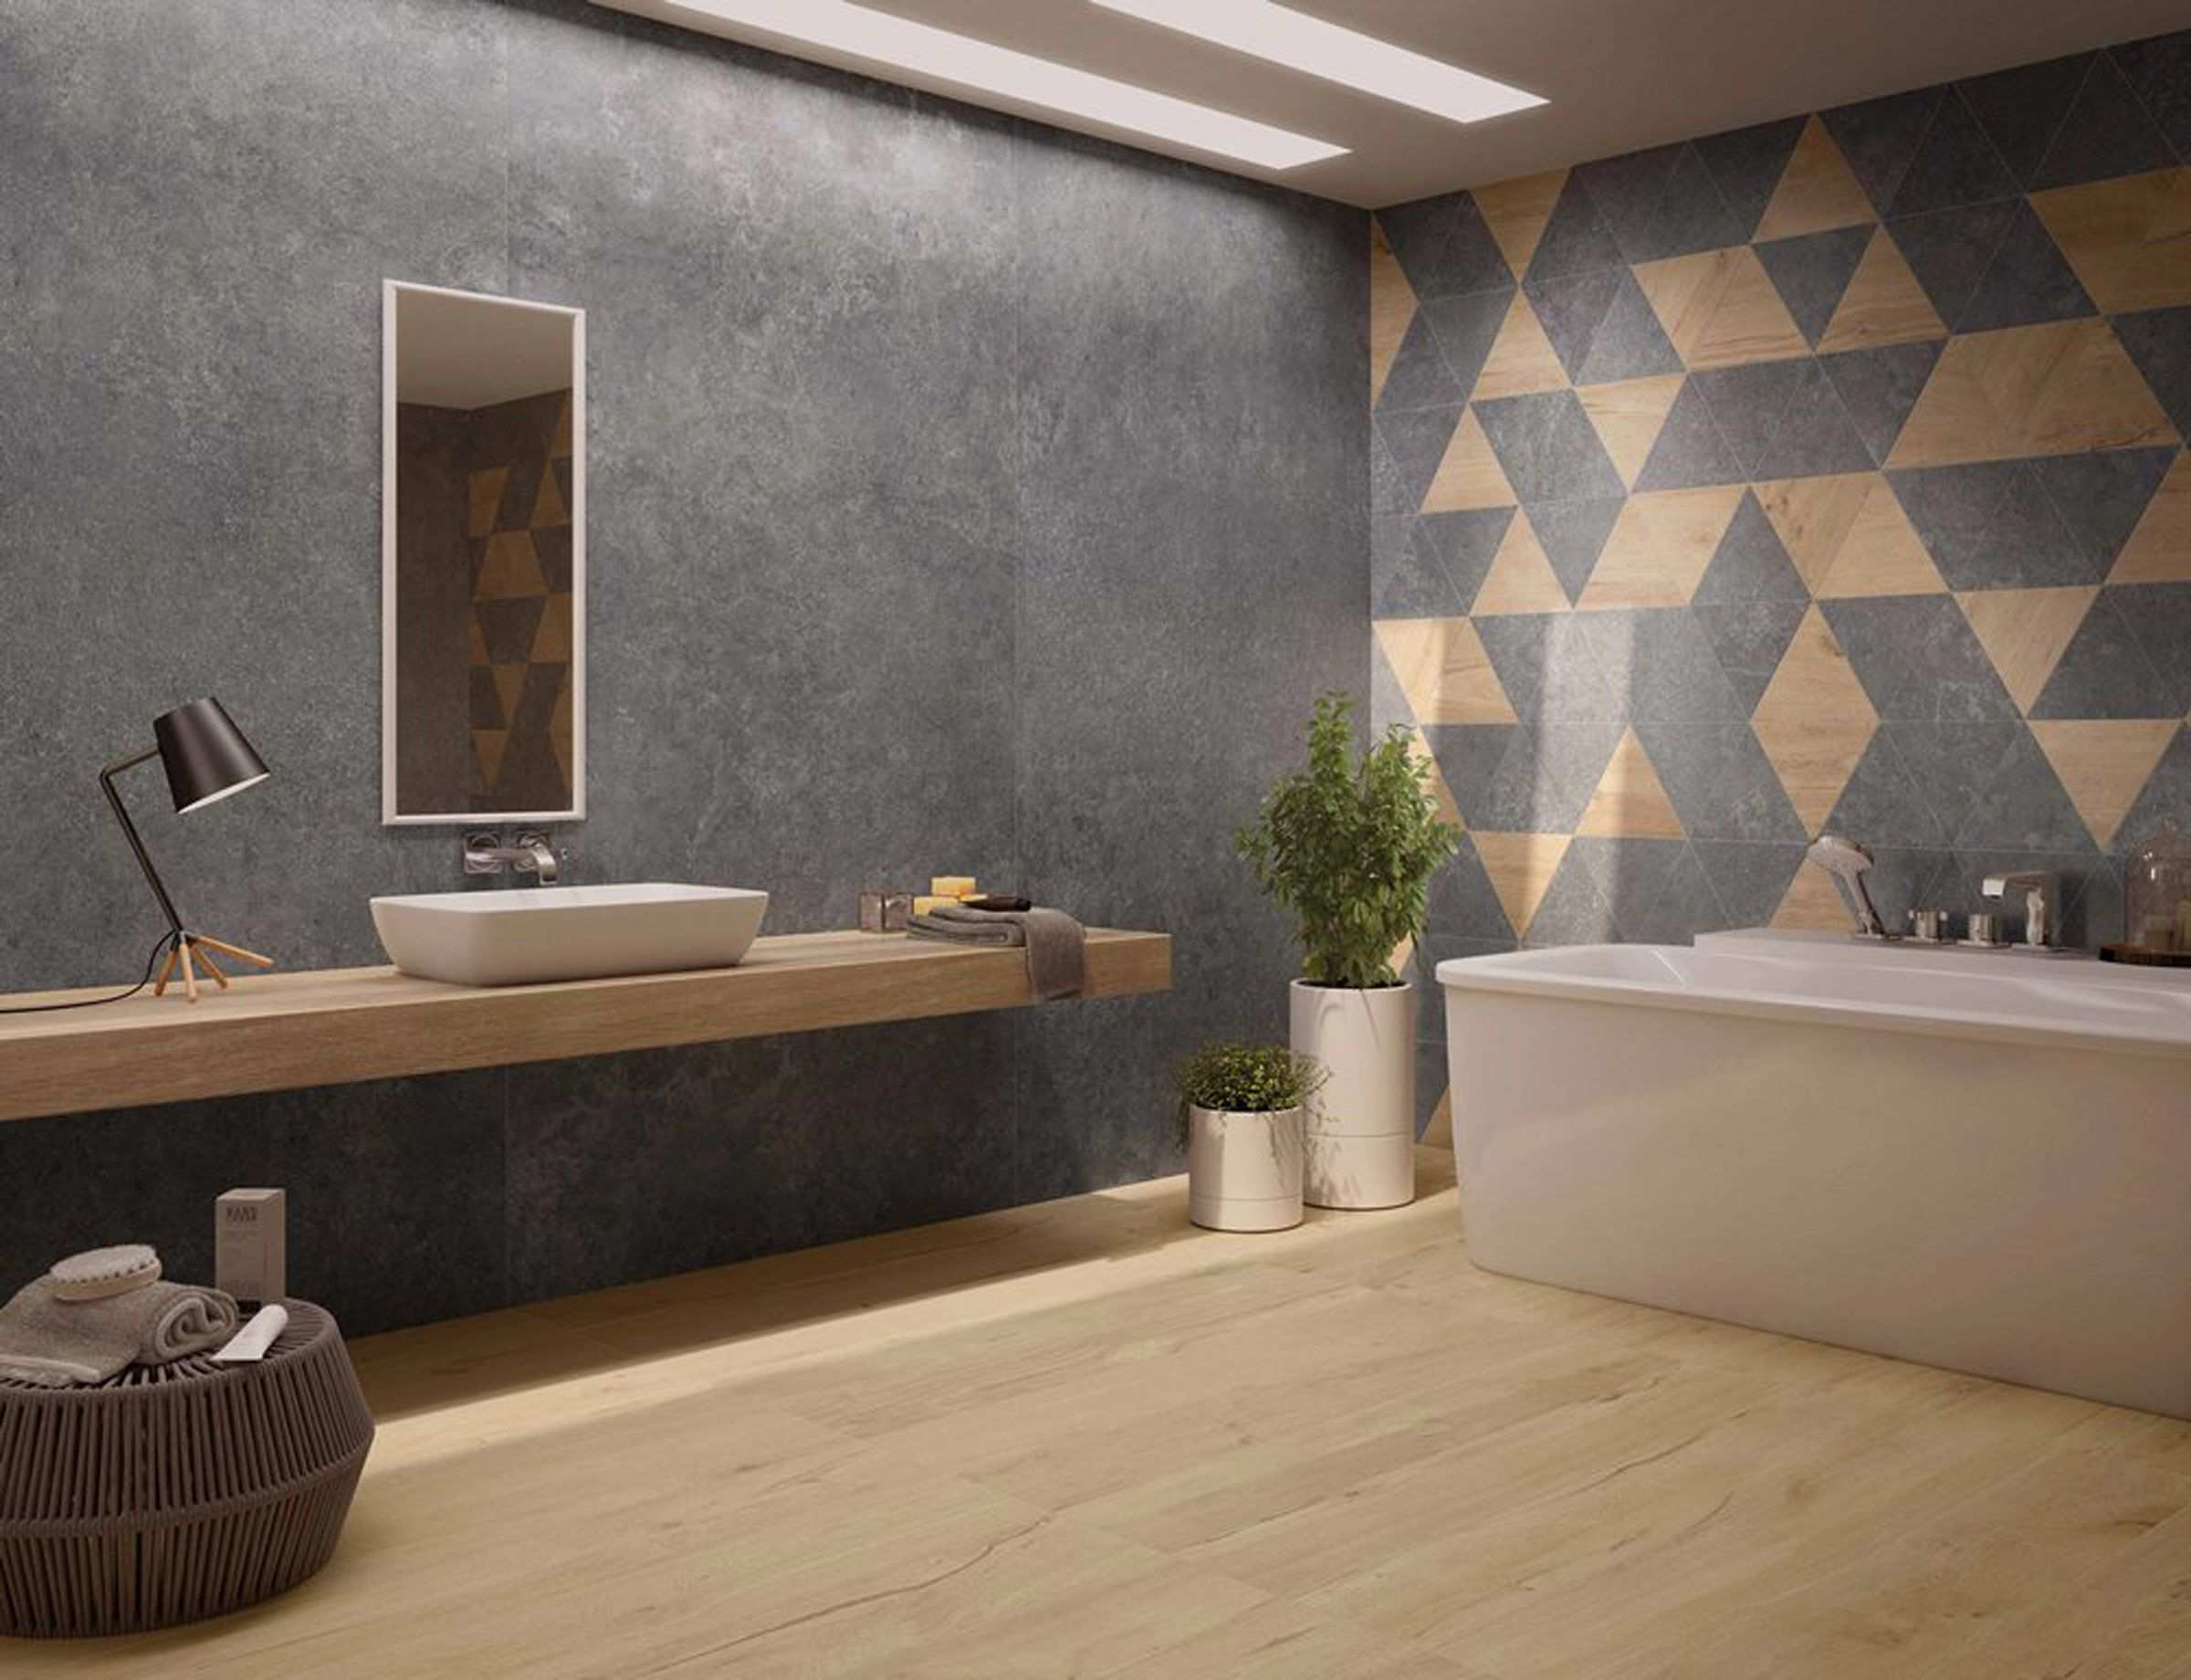 Modernes Badezimmer Bodenbelag Fur Badezimmer Bodenfliesen Bad Bodenfliesen Muster